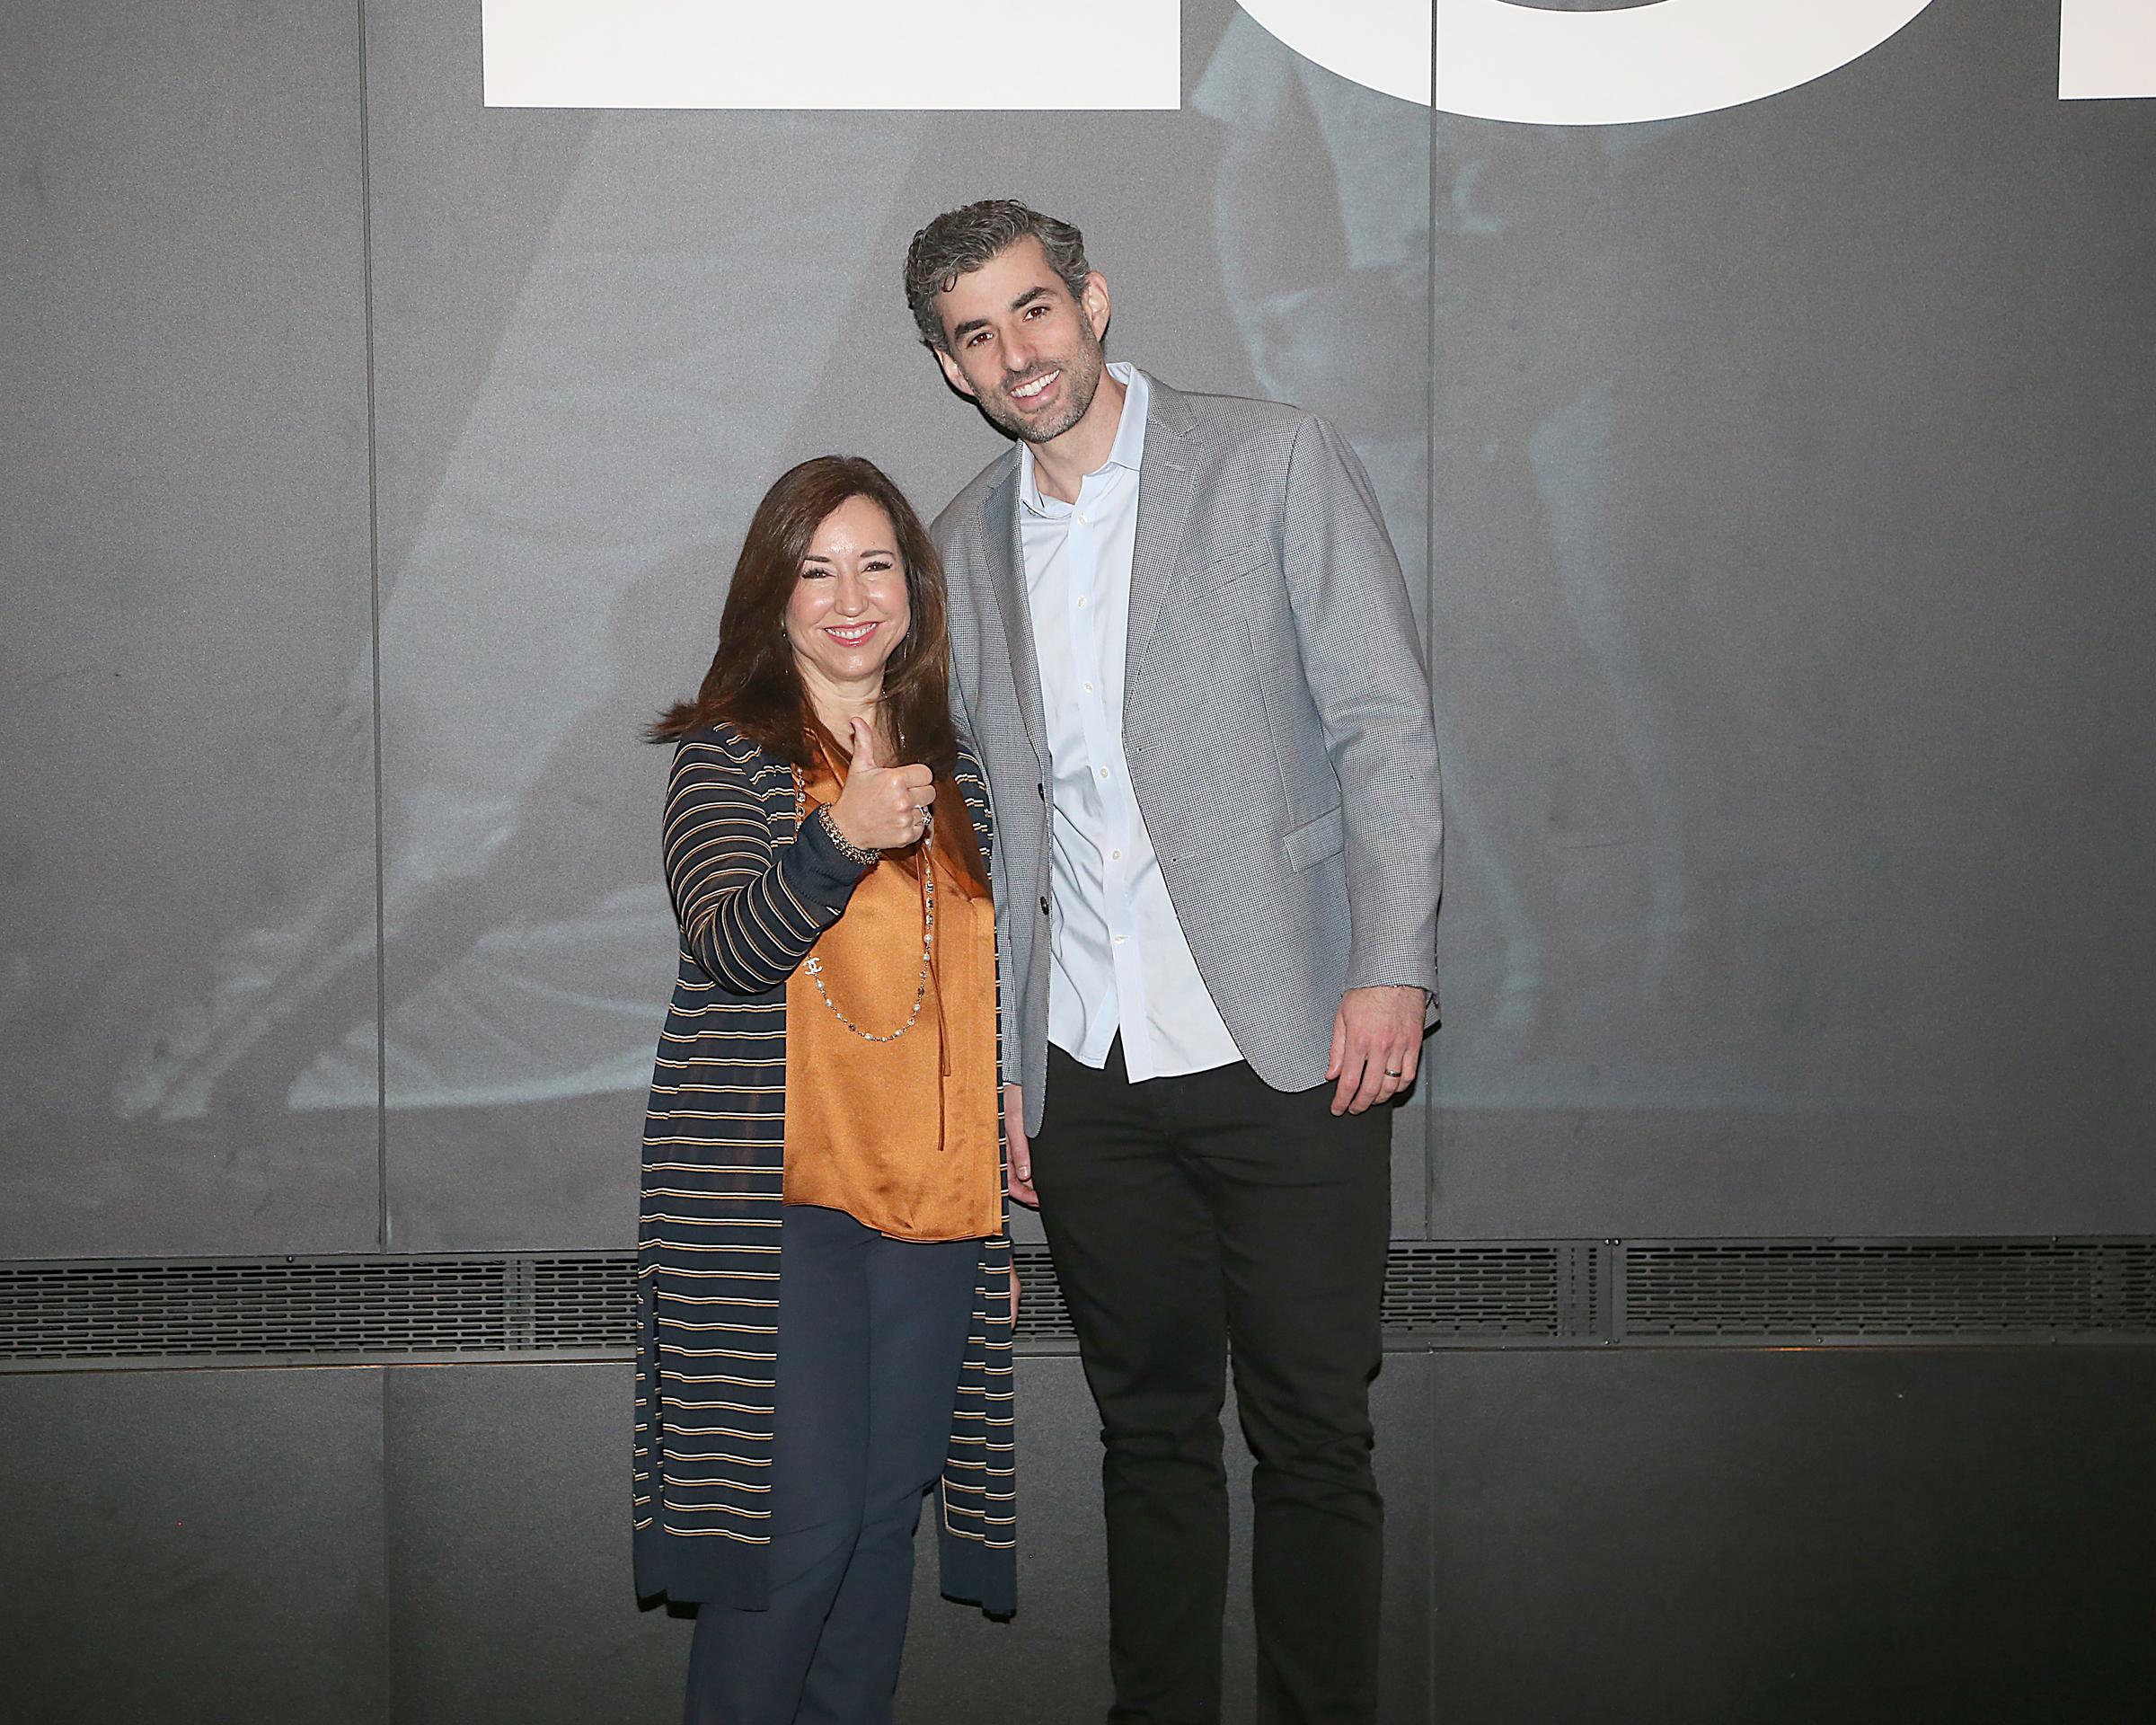 Christine Duffy and Sky Zone CEO Jeff Platt